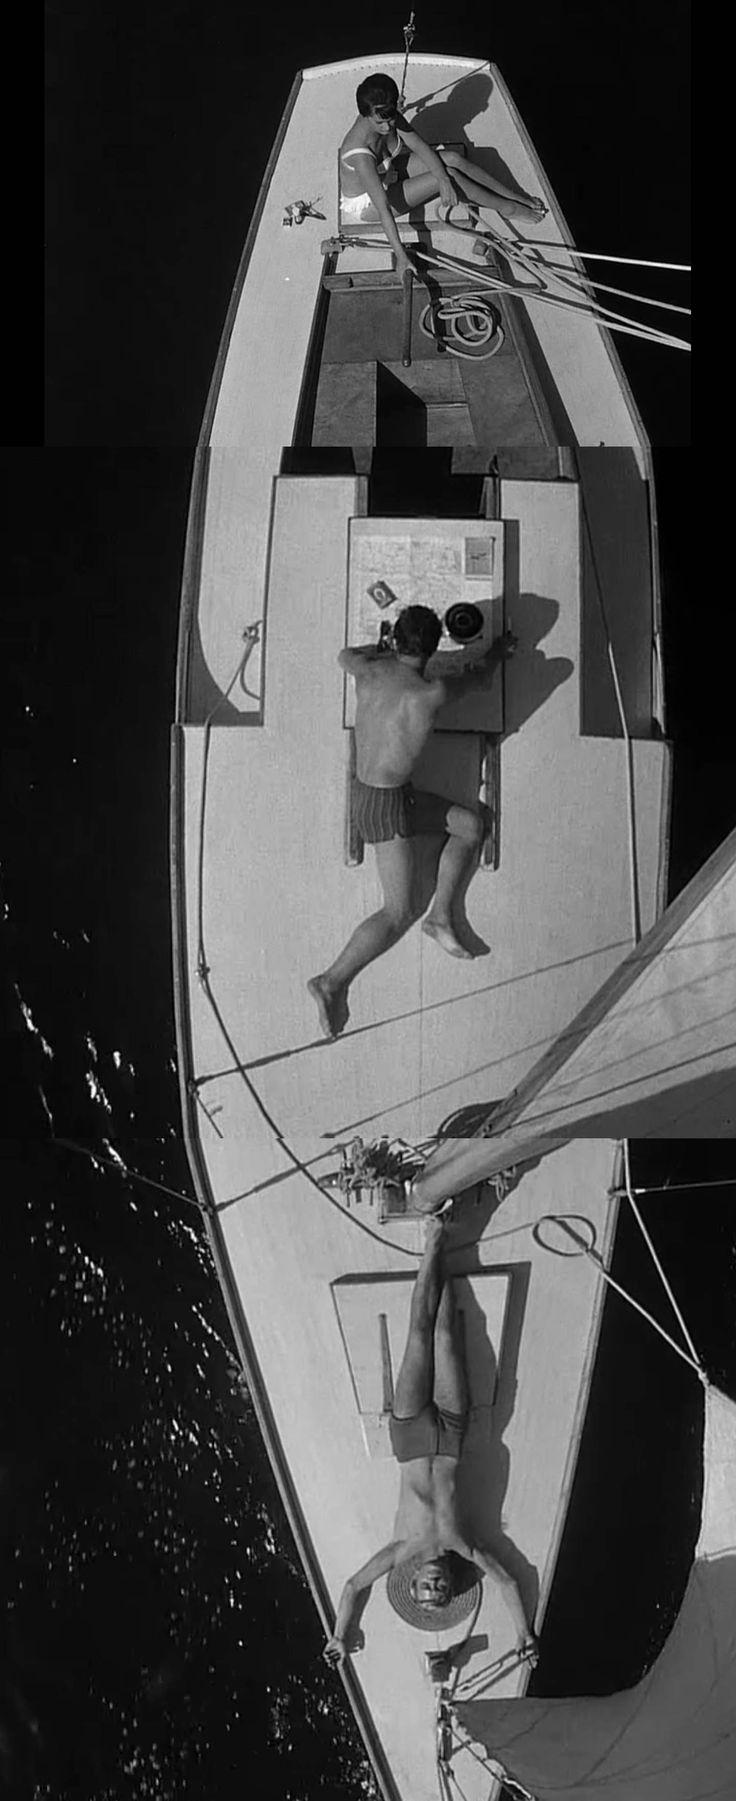 Knife in the water. 1962. Roman Polanksi.